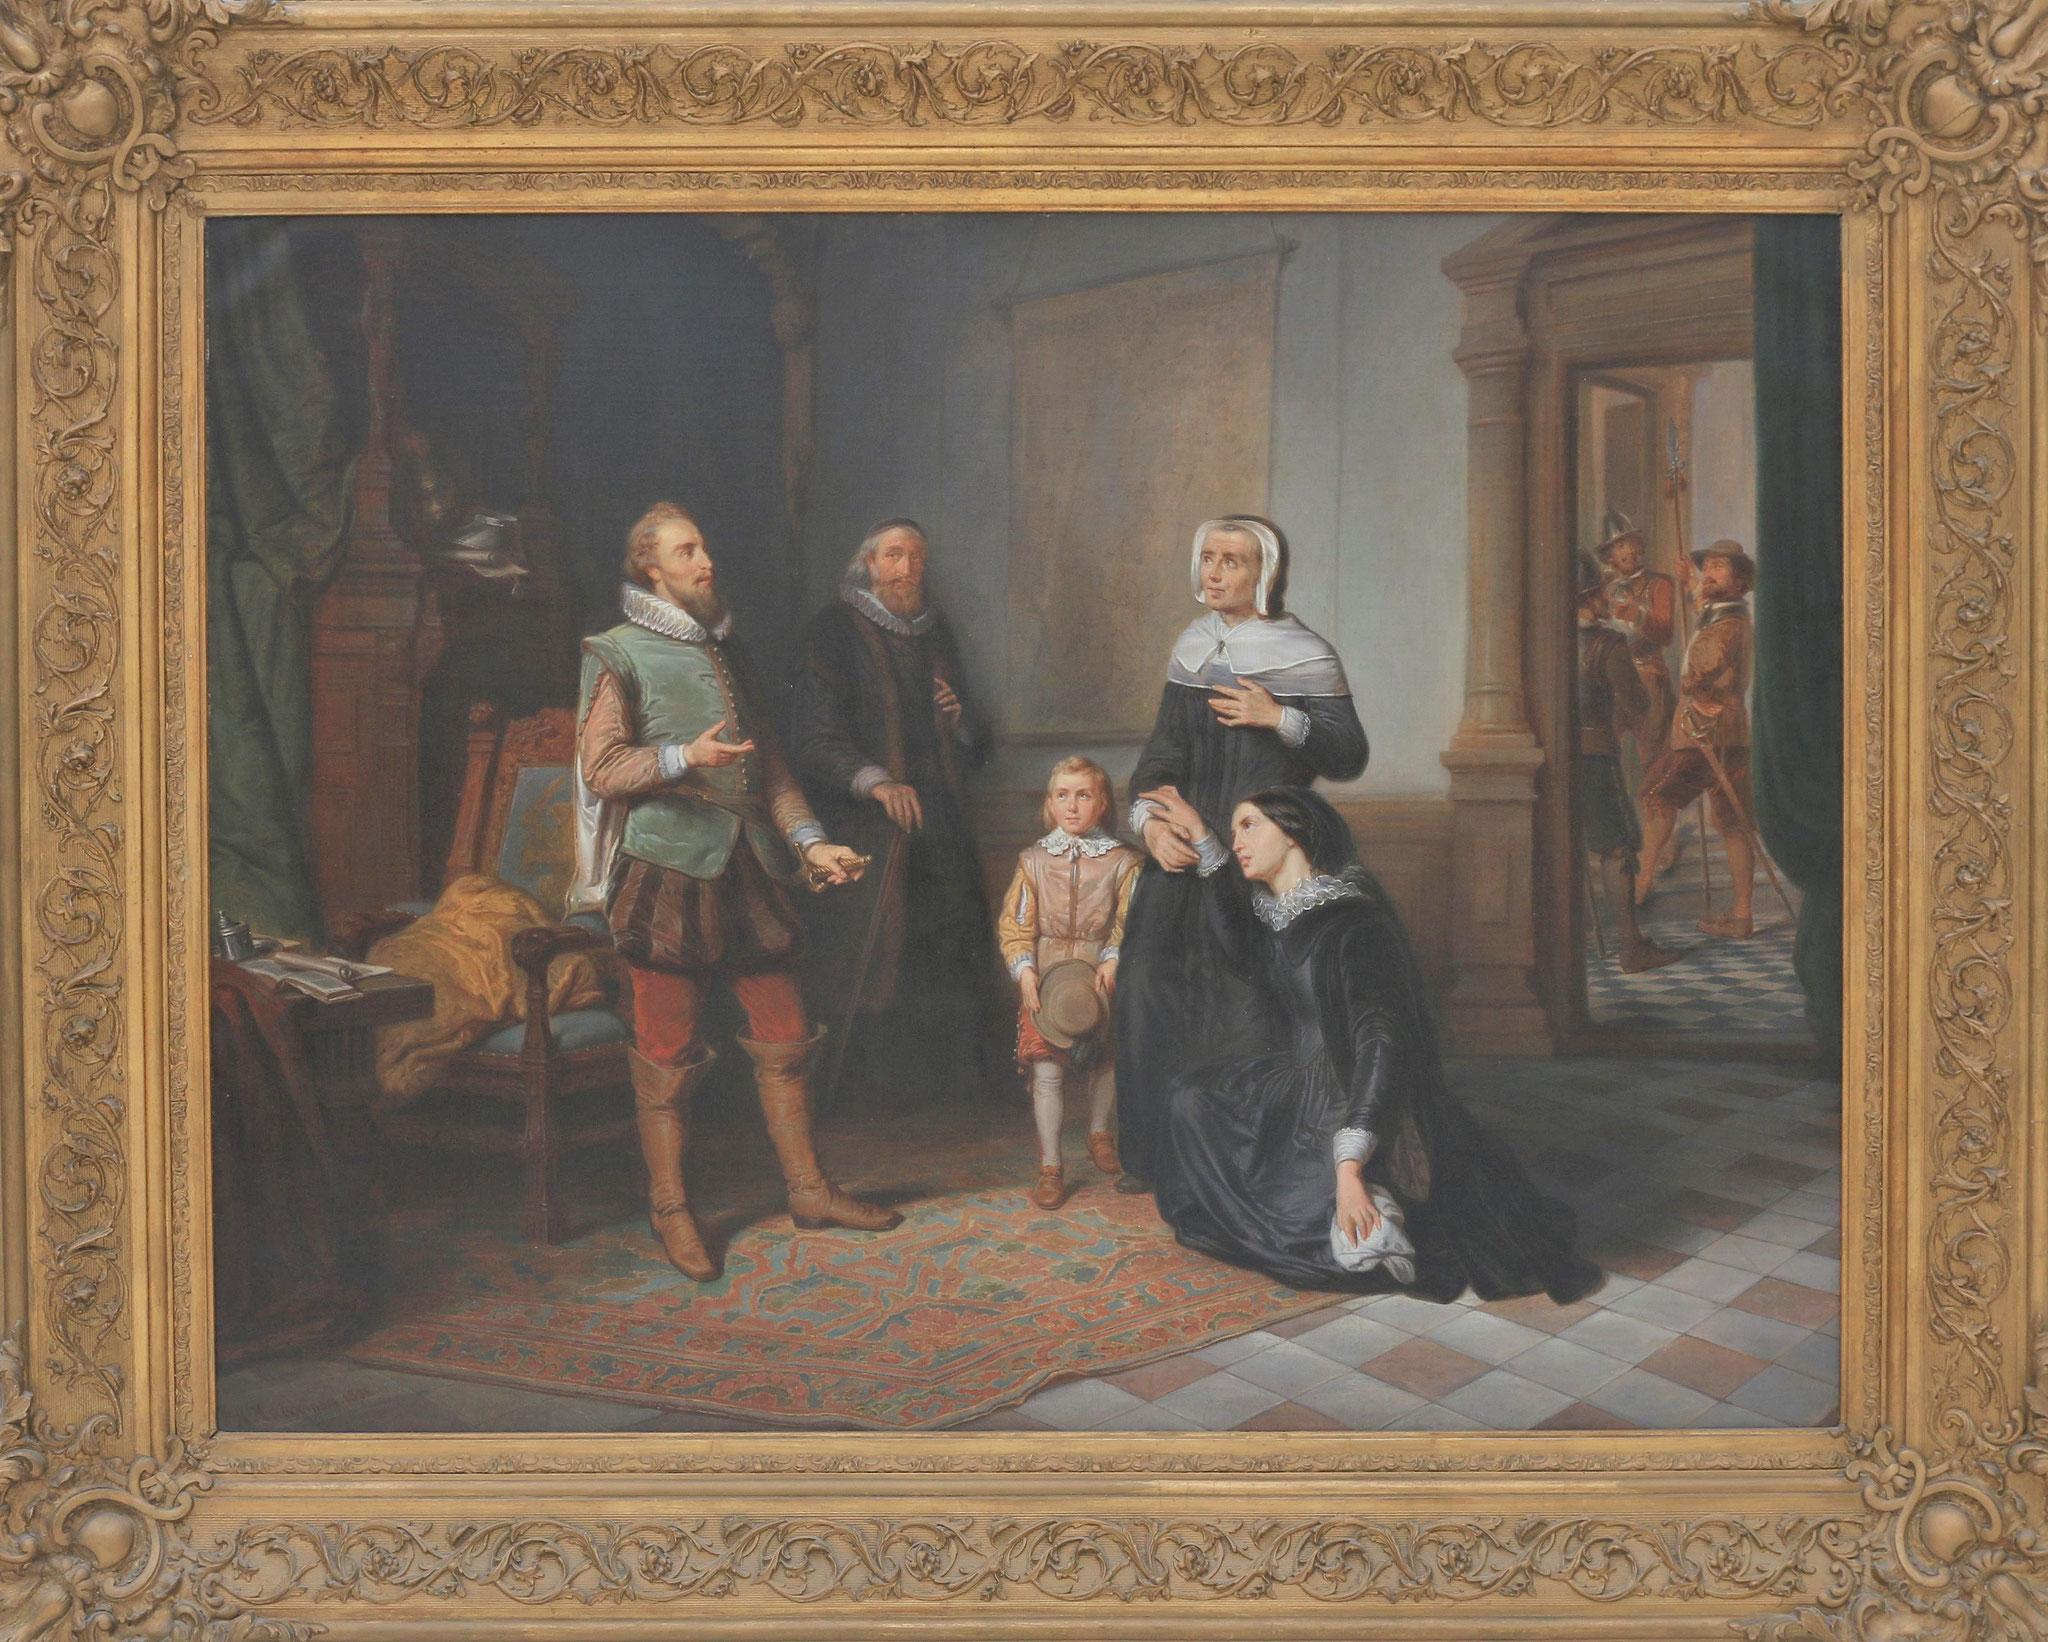 Pieter Alardus Haaxman (1814-1887) | Taxatiewaarde: 19.500,= euro